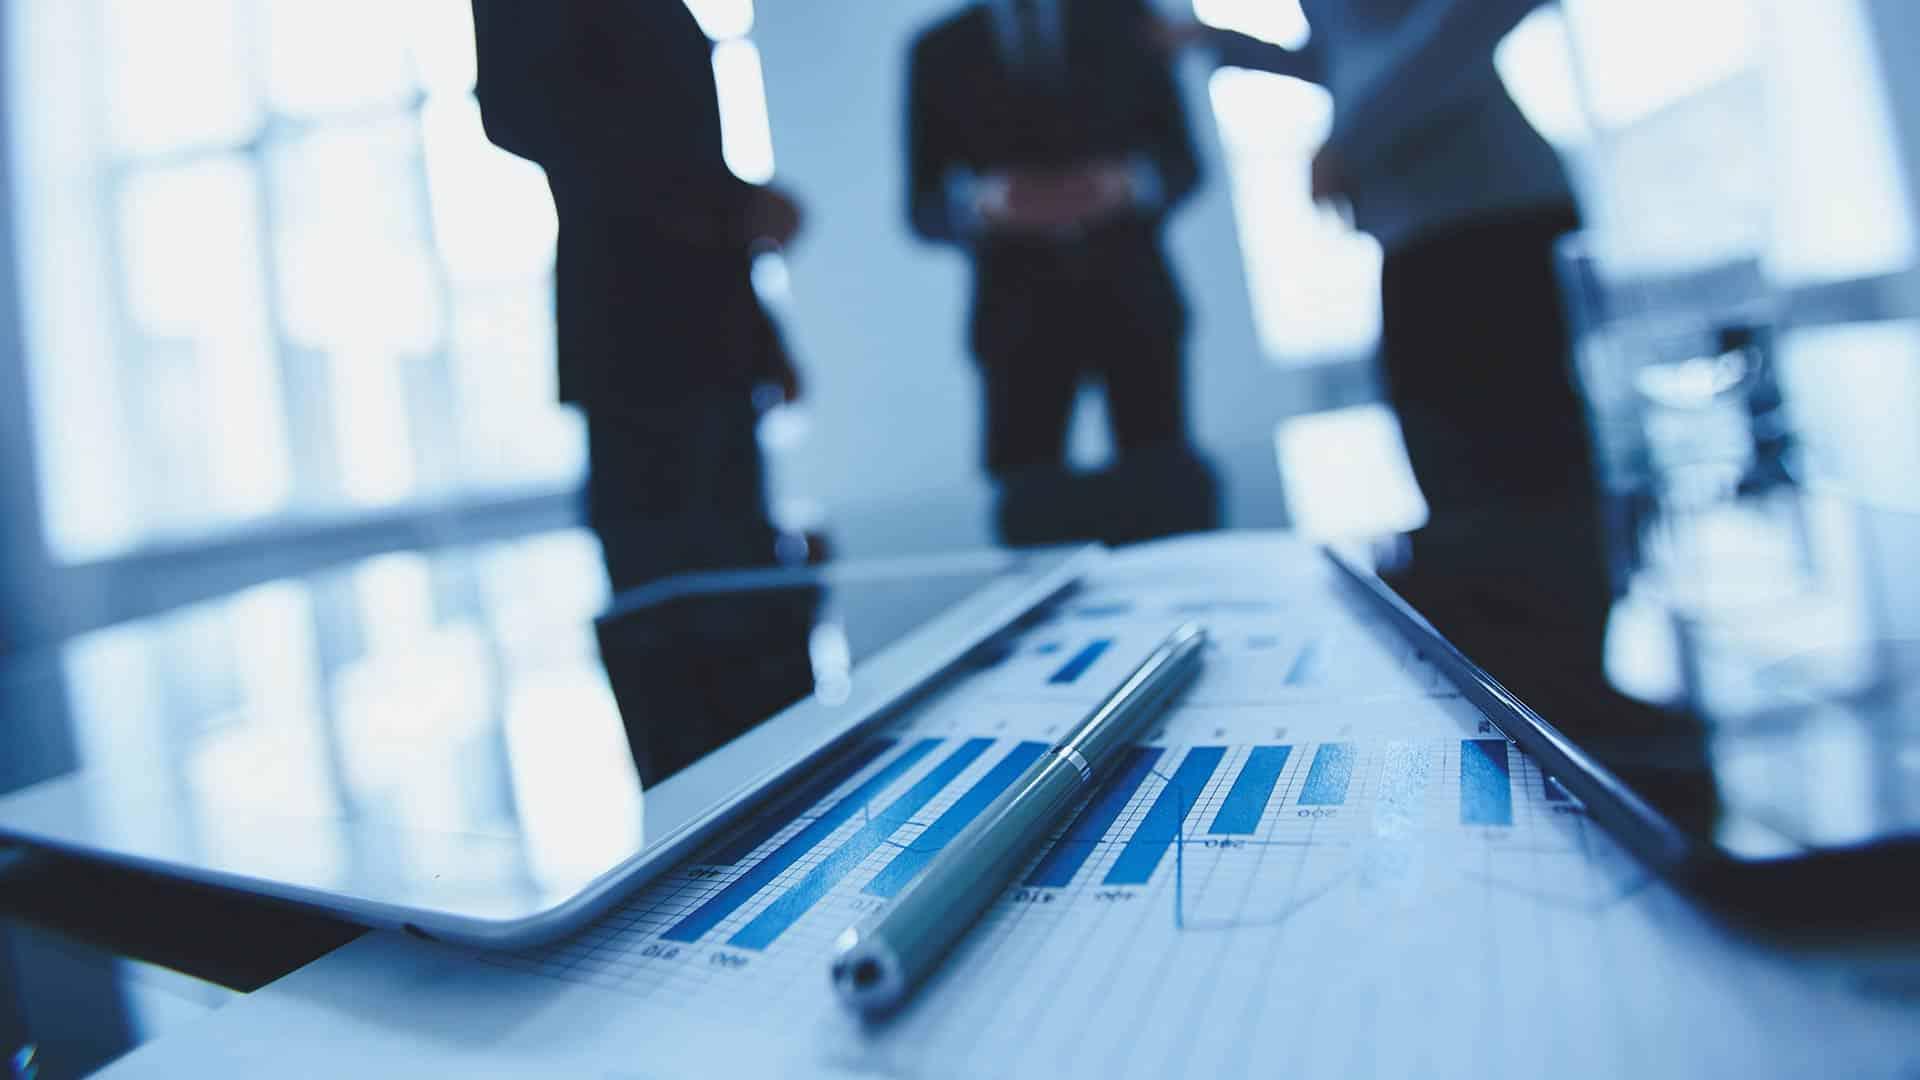 Invest in Israeli startups